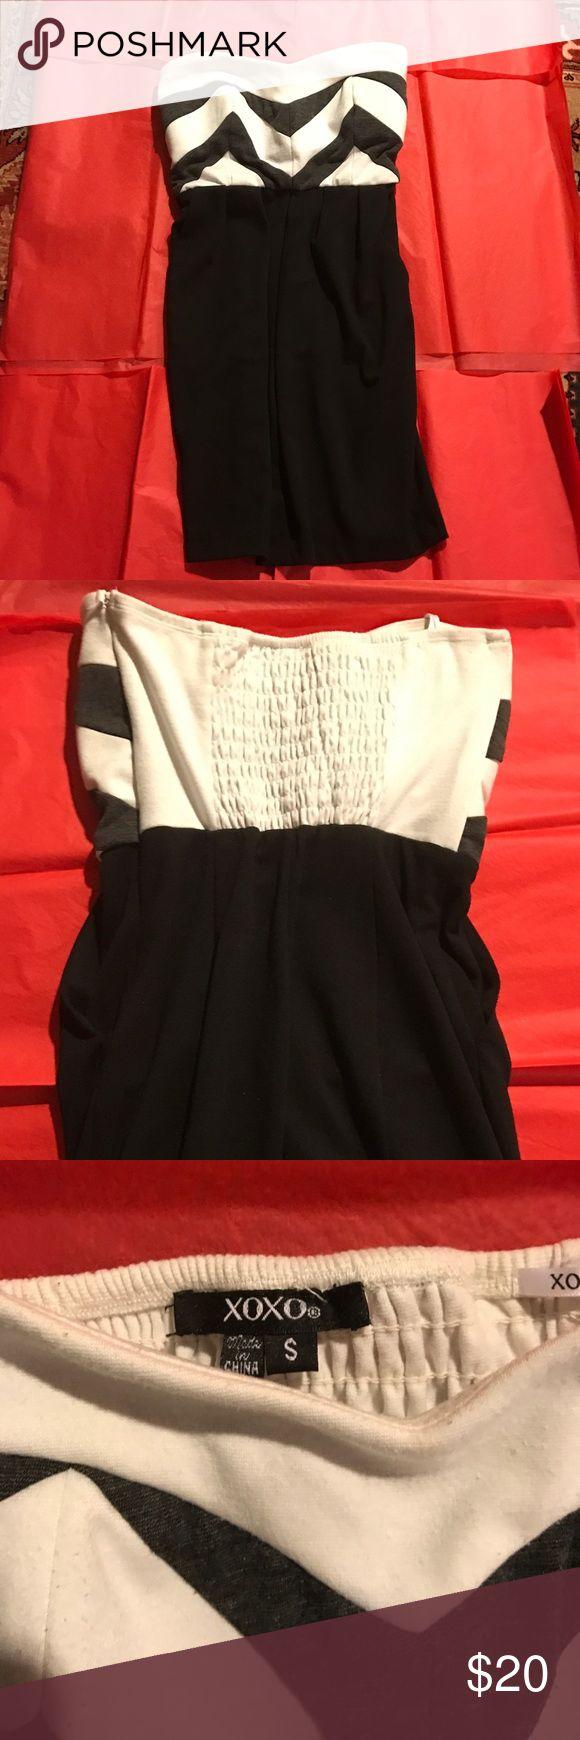 XOXO BLACK n white tube top dress Size small. Worn once. Very small dress XOXO Dresses Mini